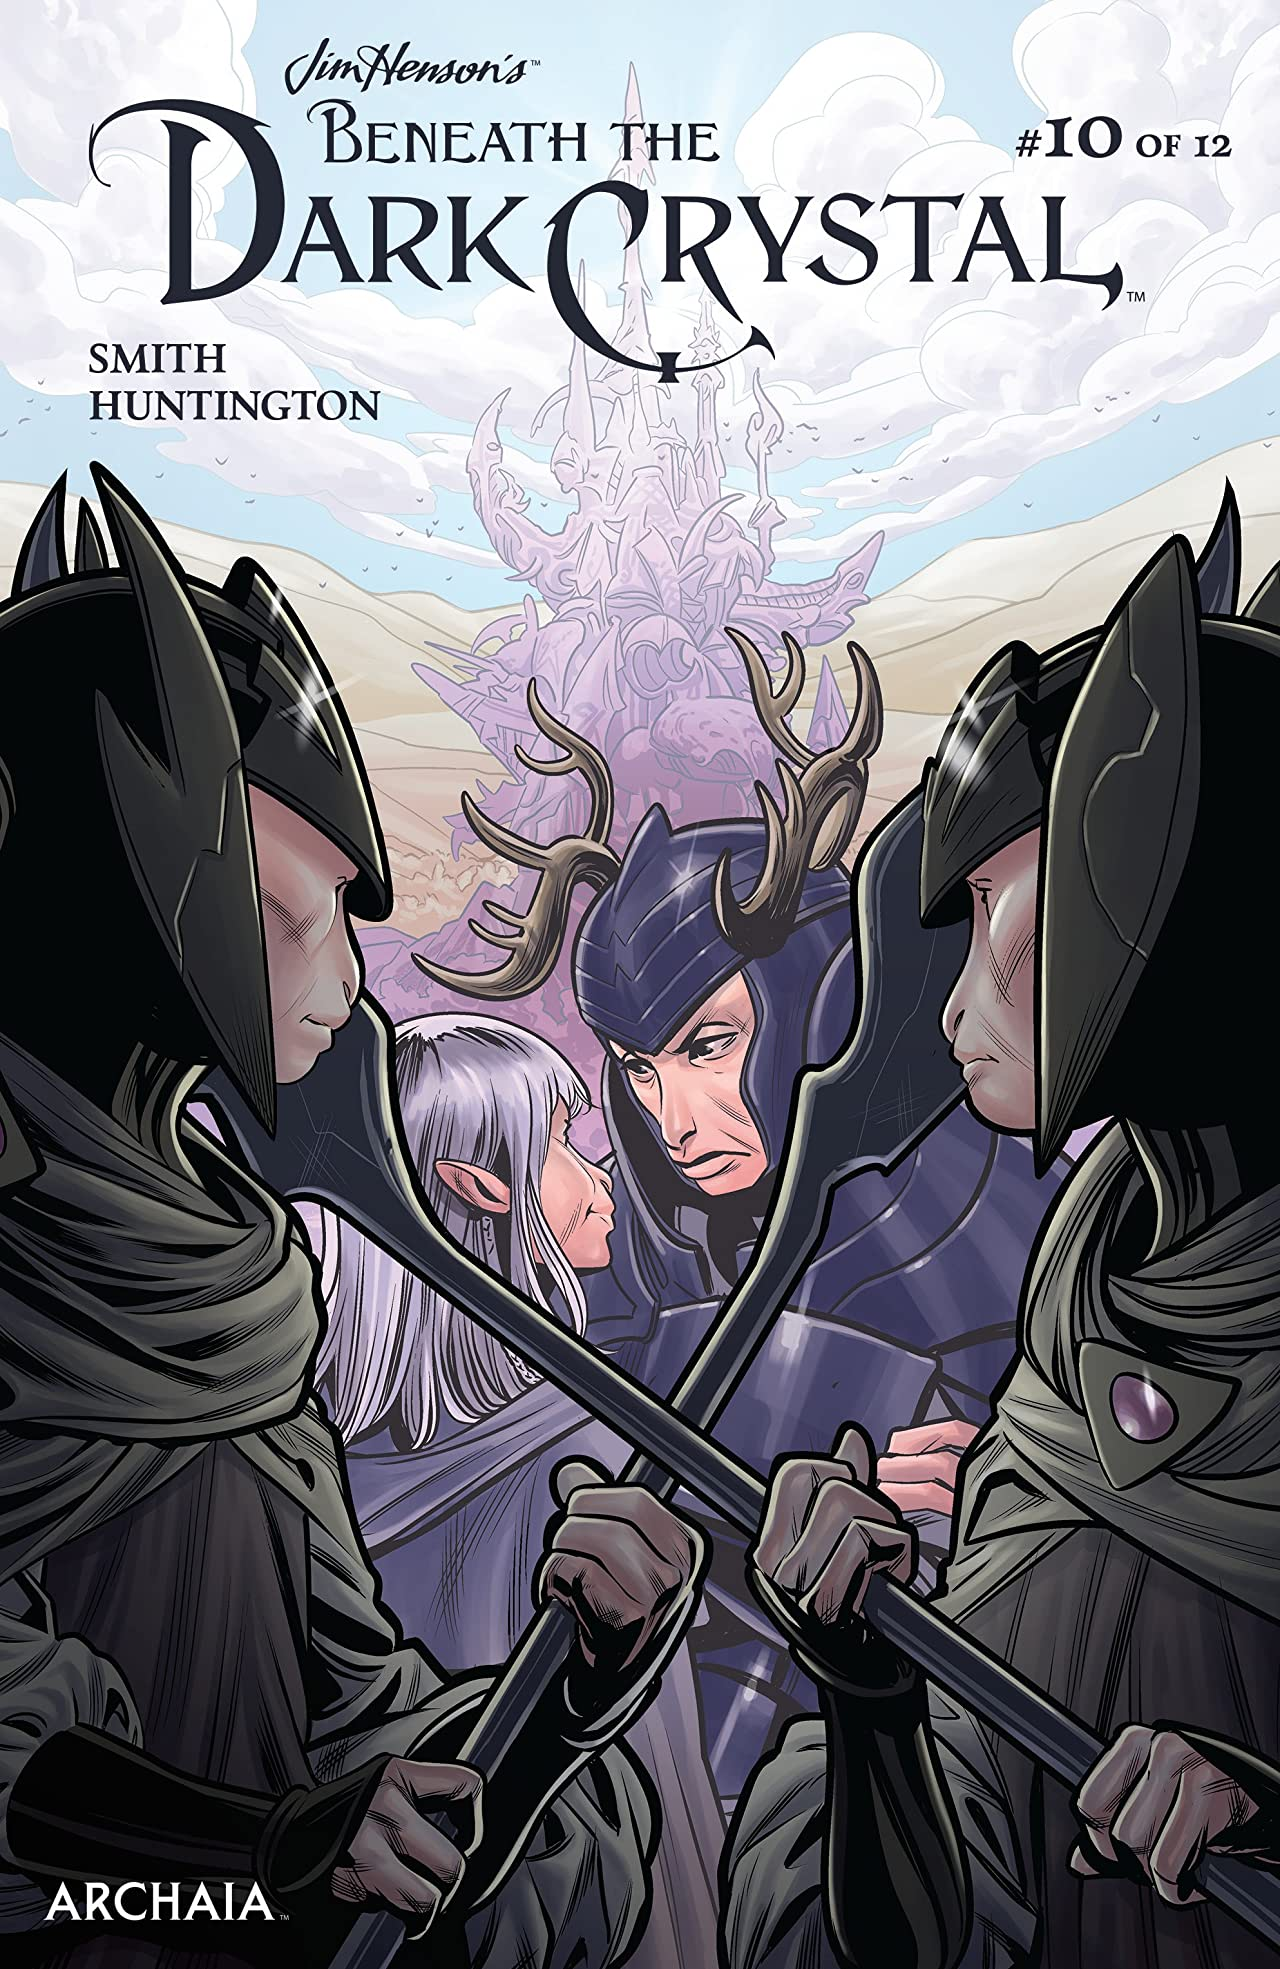 Jim Henson's Beneath the Dark Crystal #10